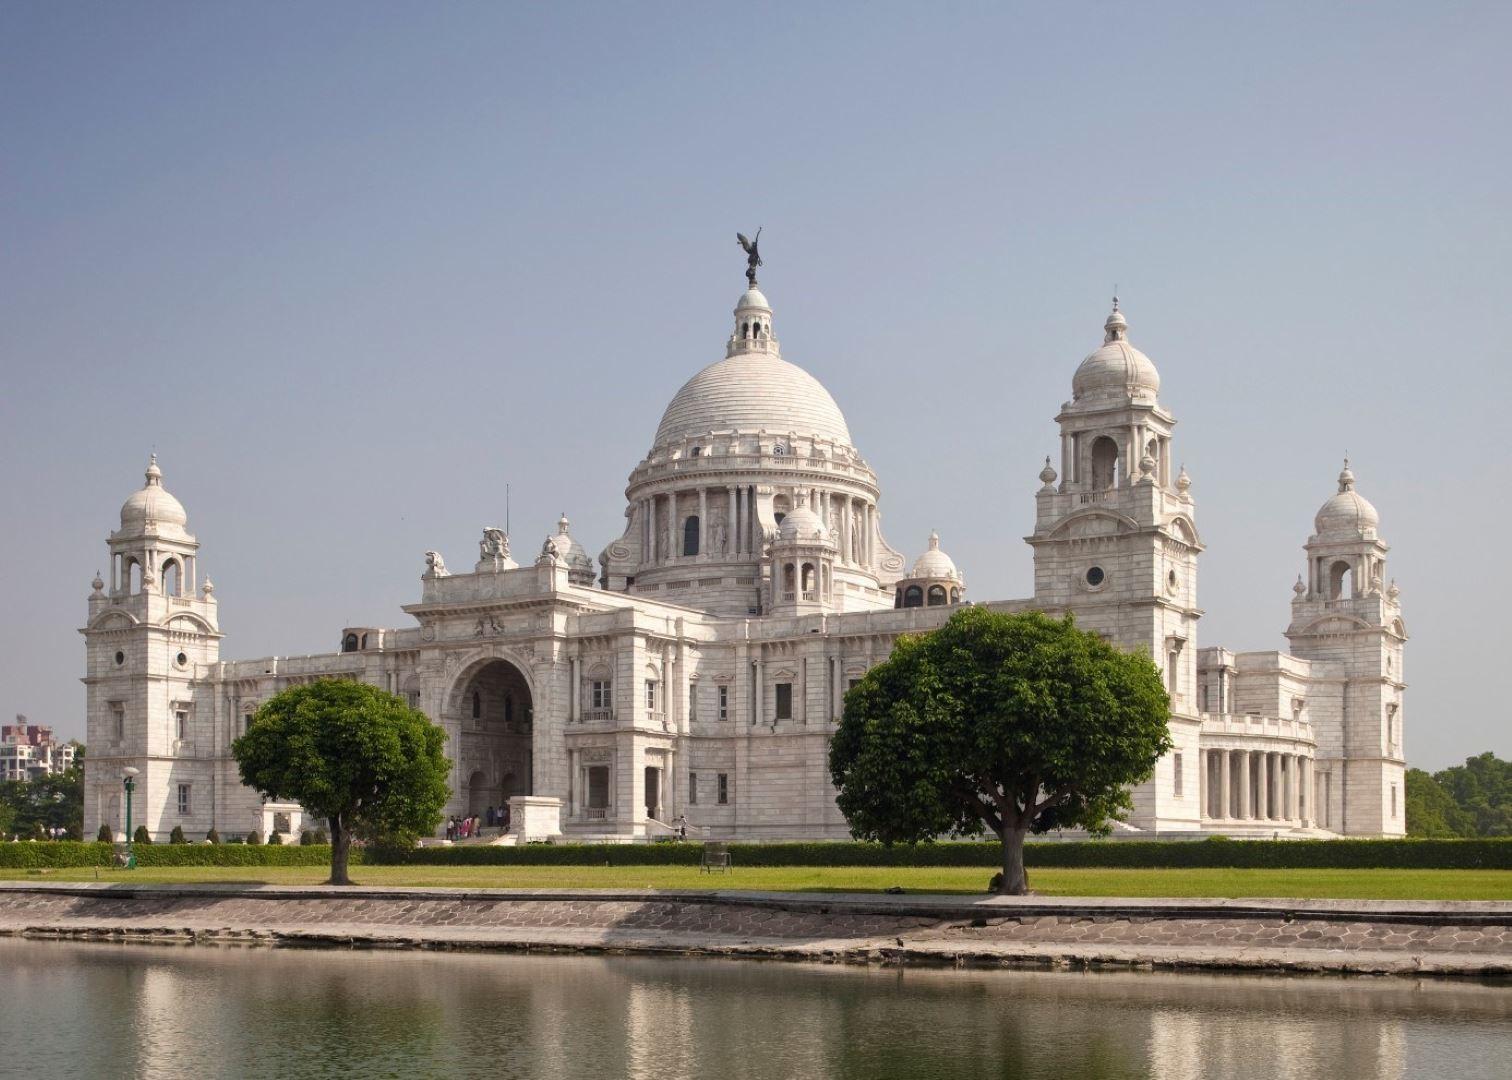 Experience in Calcutta, India by Sanaika